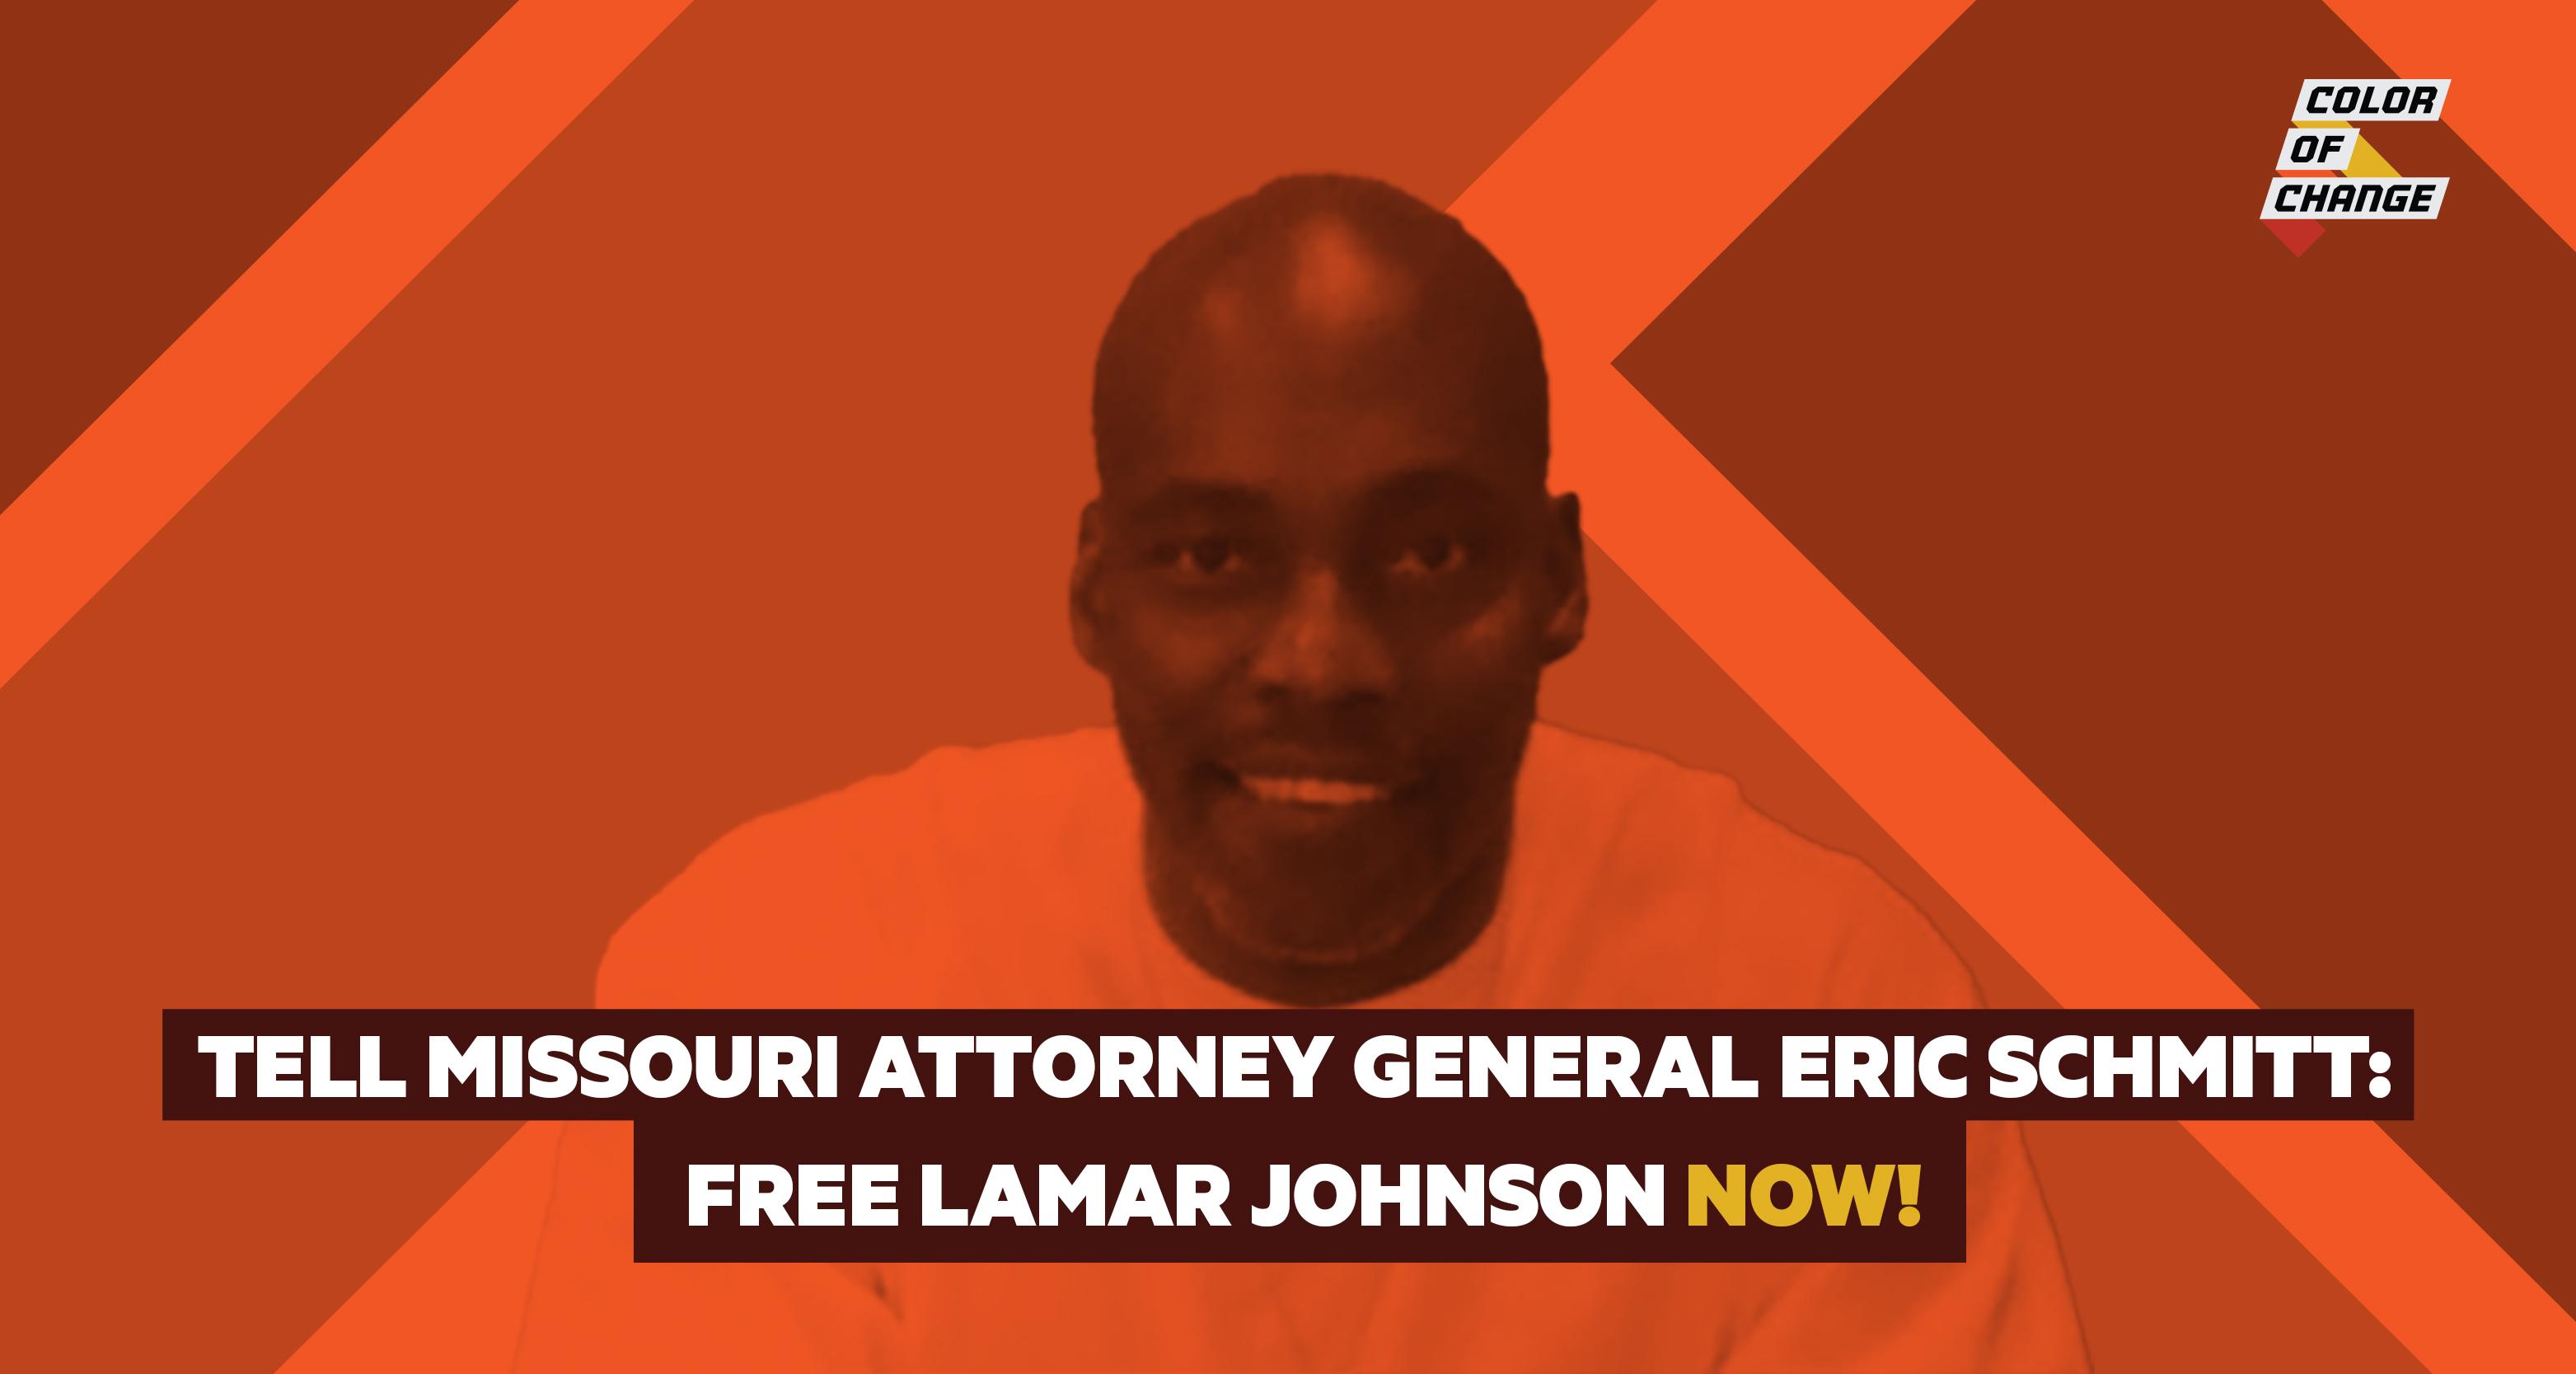 Tell Missouri Attorney General Eric Schmitt: Free Lamar Johnson NOW!